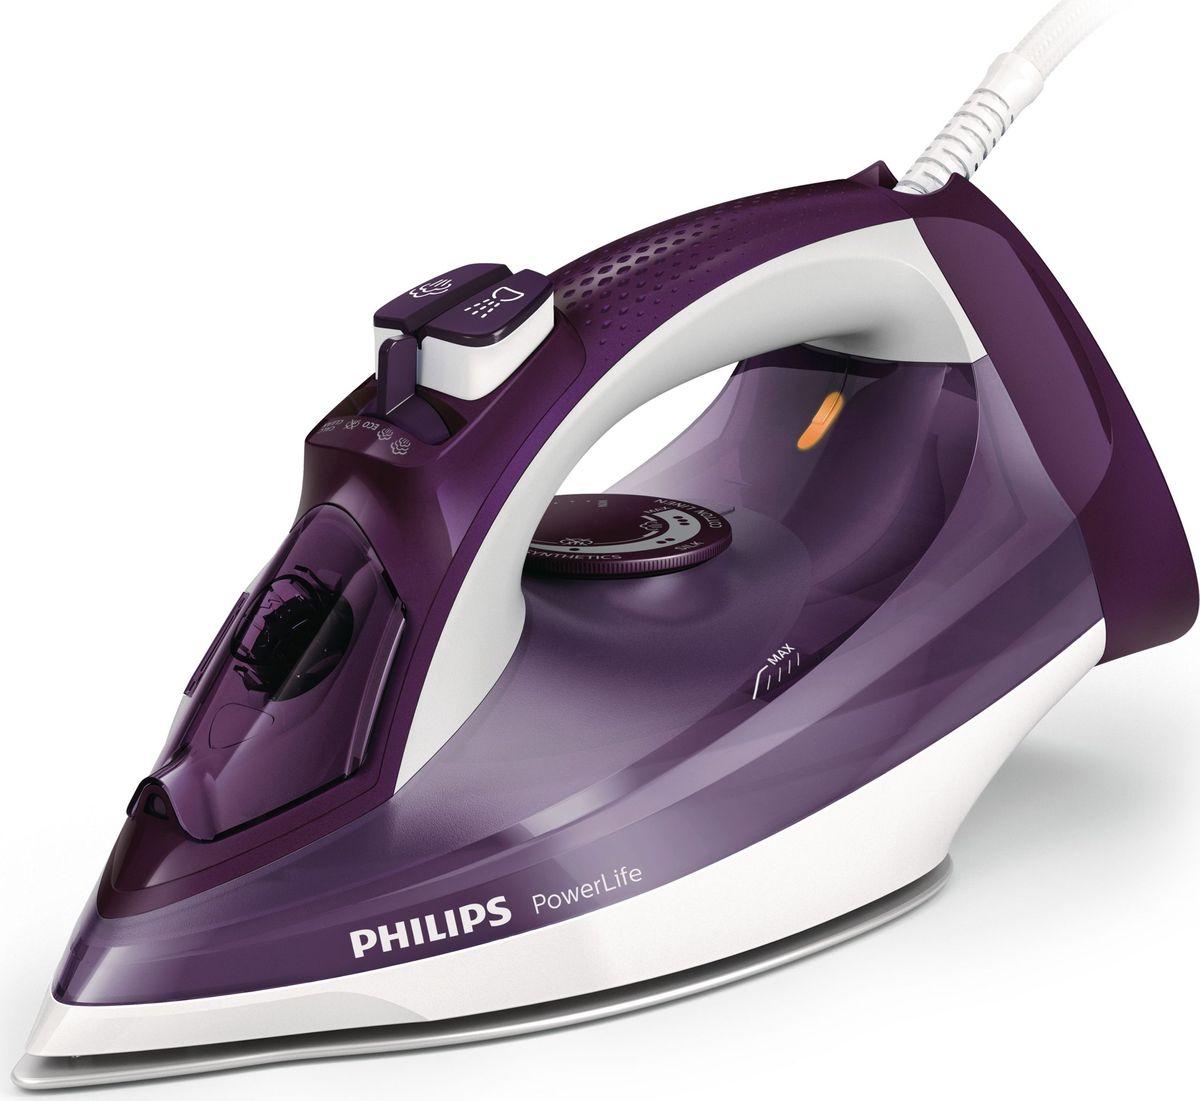 Philips GC2995/30 PowerLife, White Purple утюг philips gc 2982 30 powerlife plus